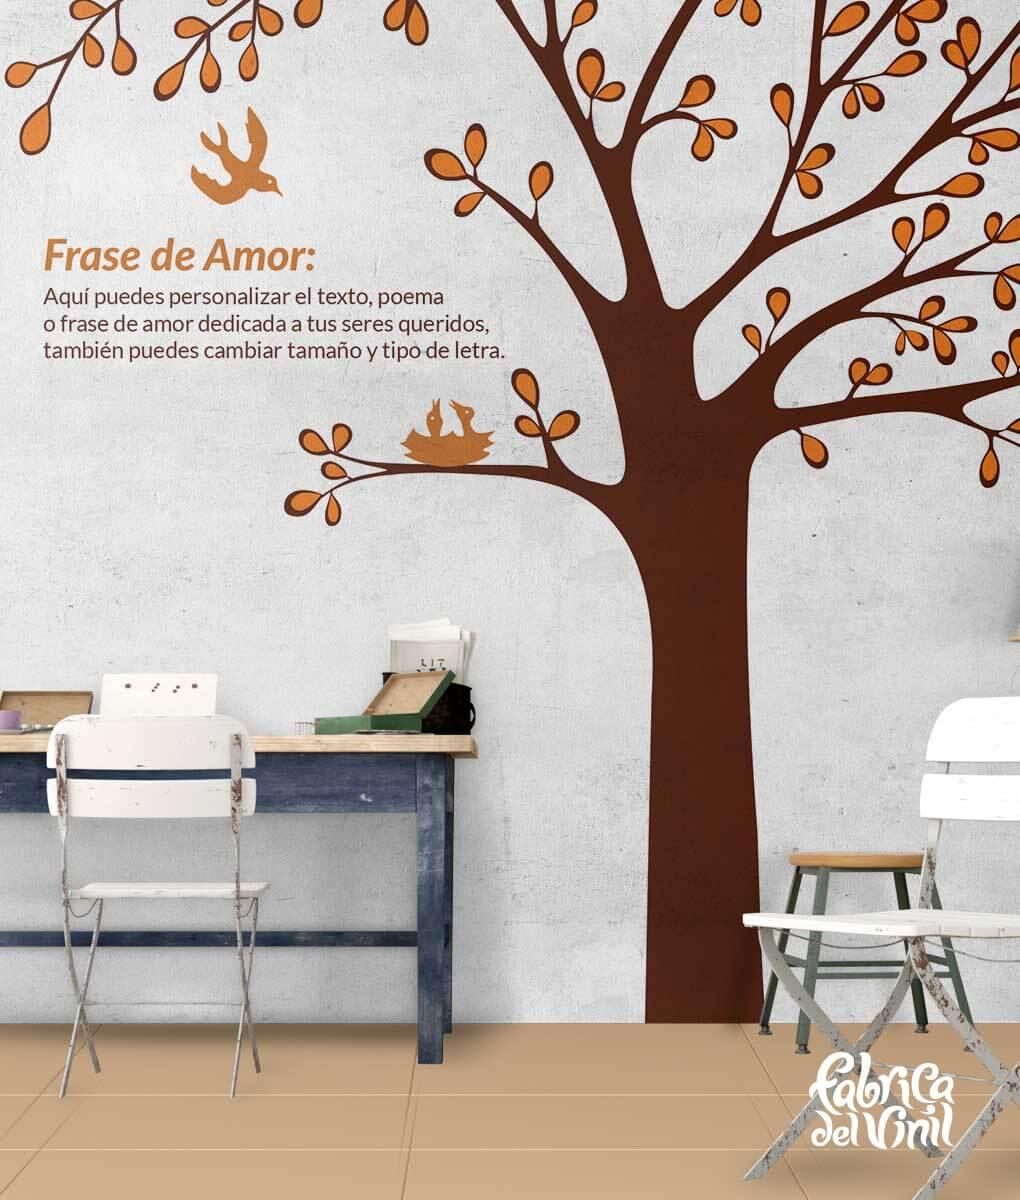 Arbol Frase Winnie Pooh Otono Brown Orange Terracotta Fabrica Del